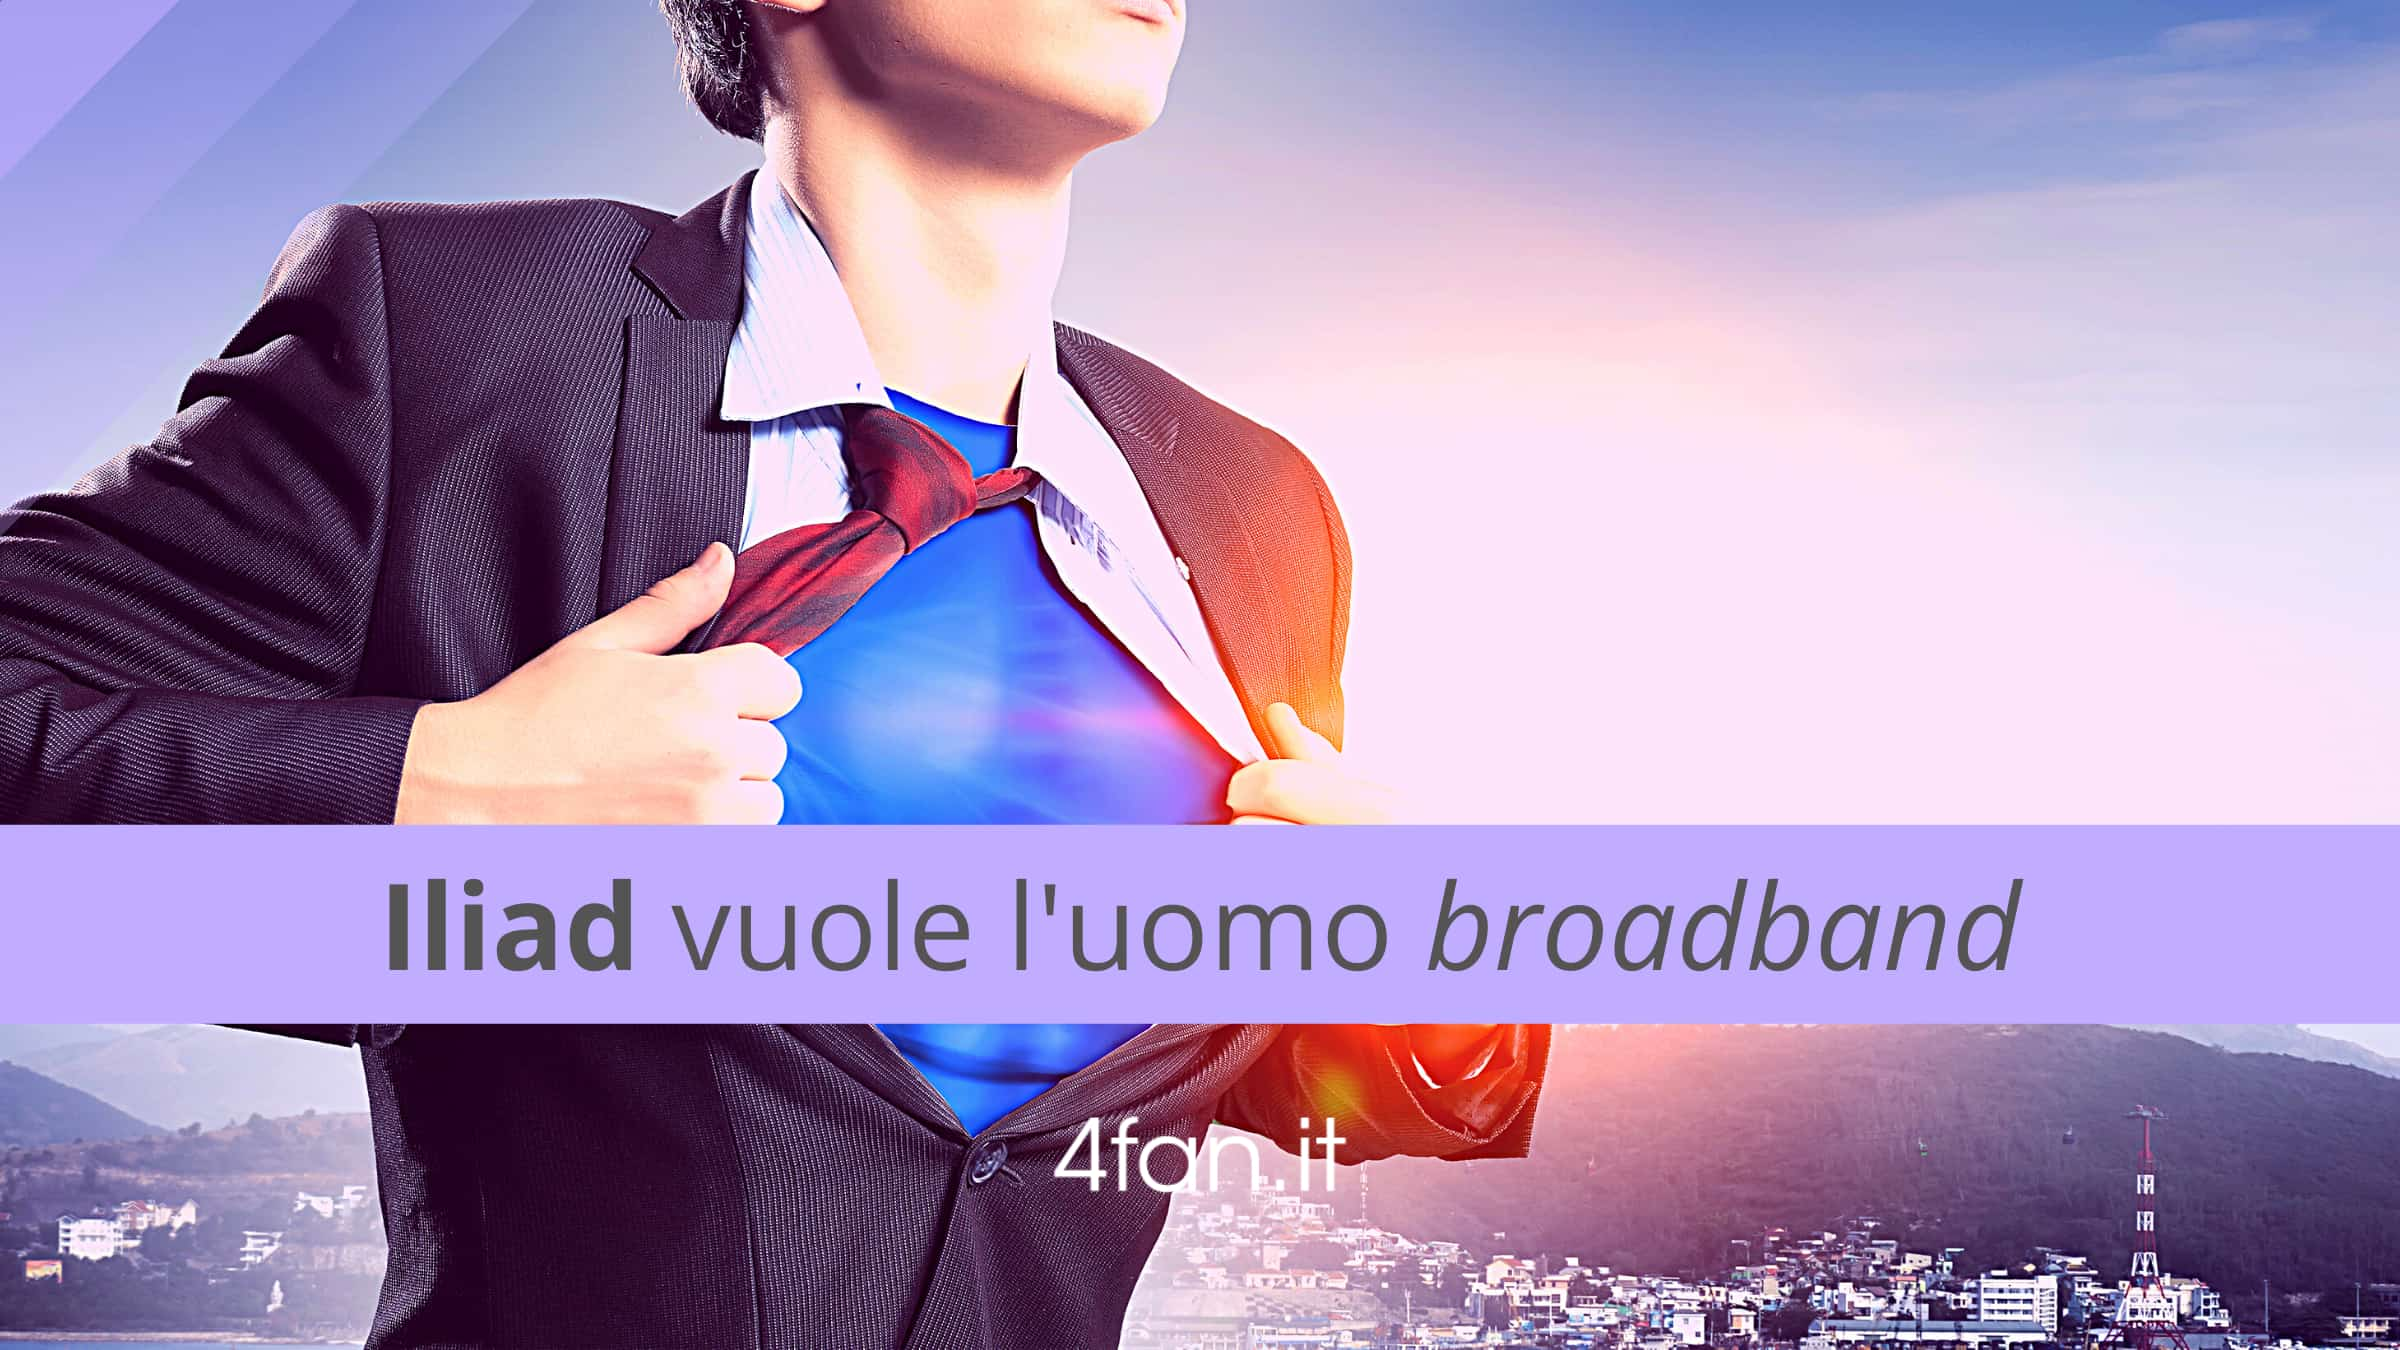 Iliad uomo broadband